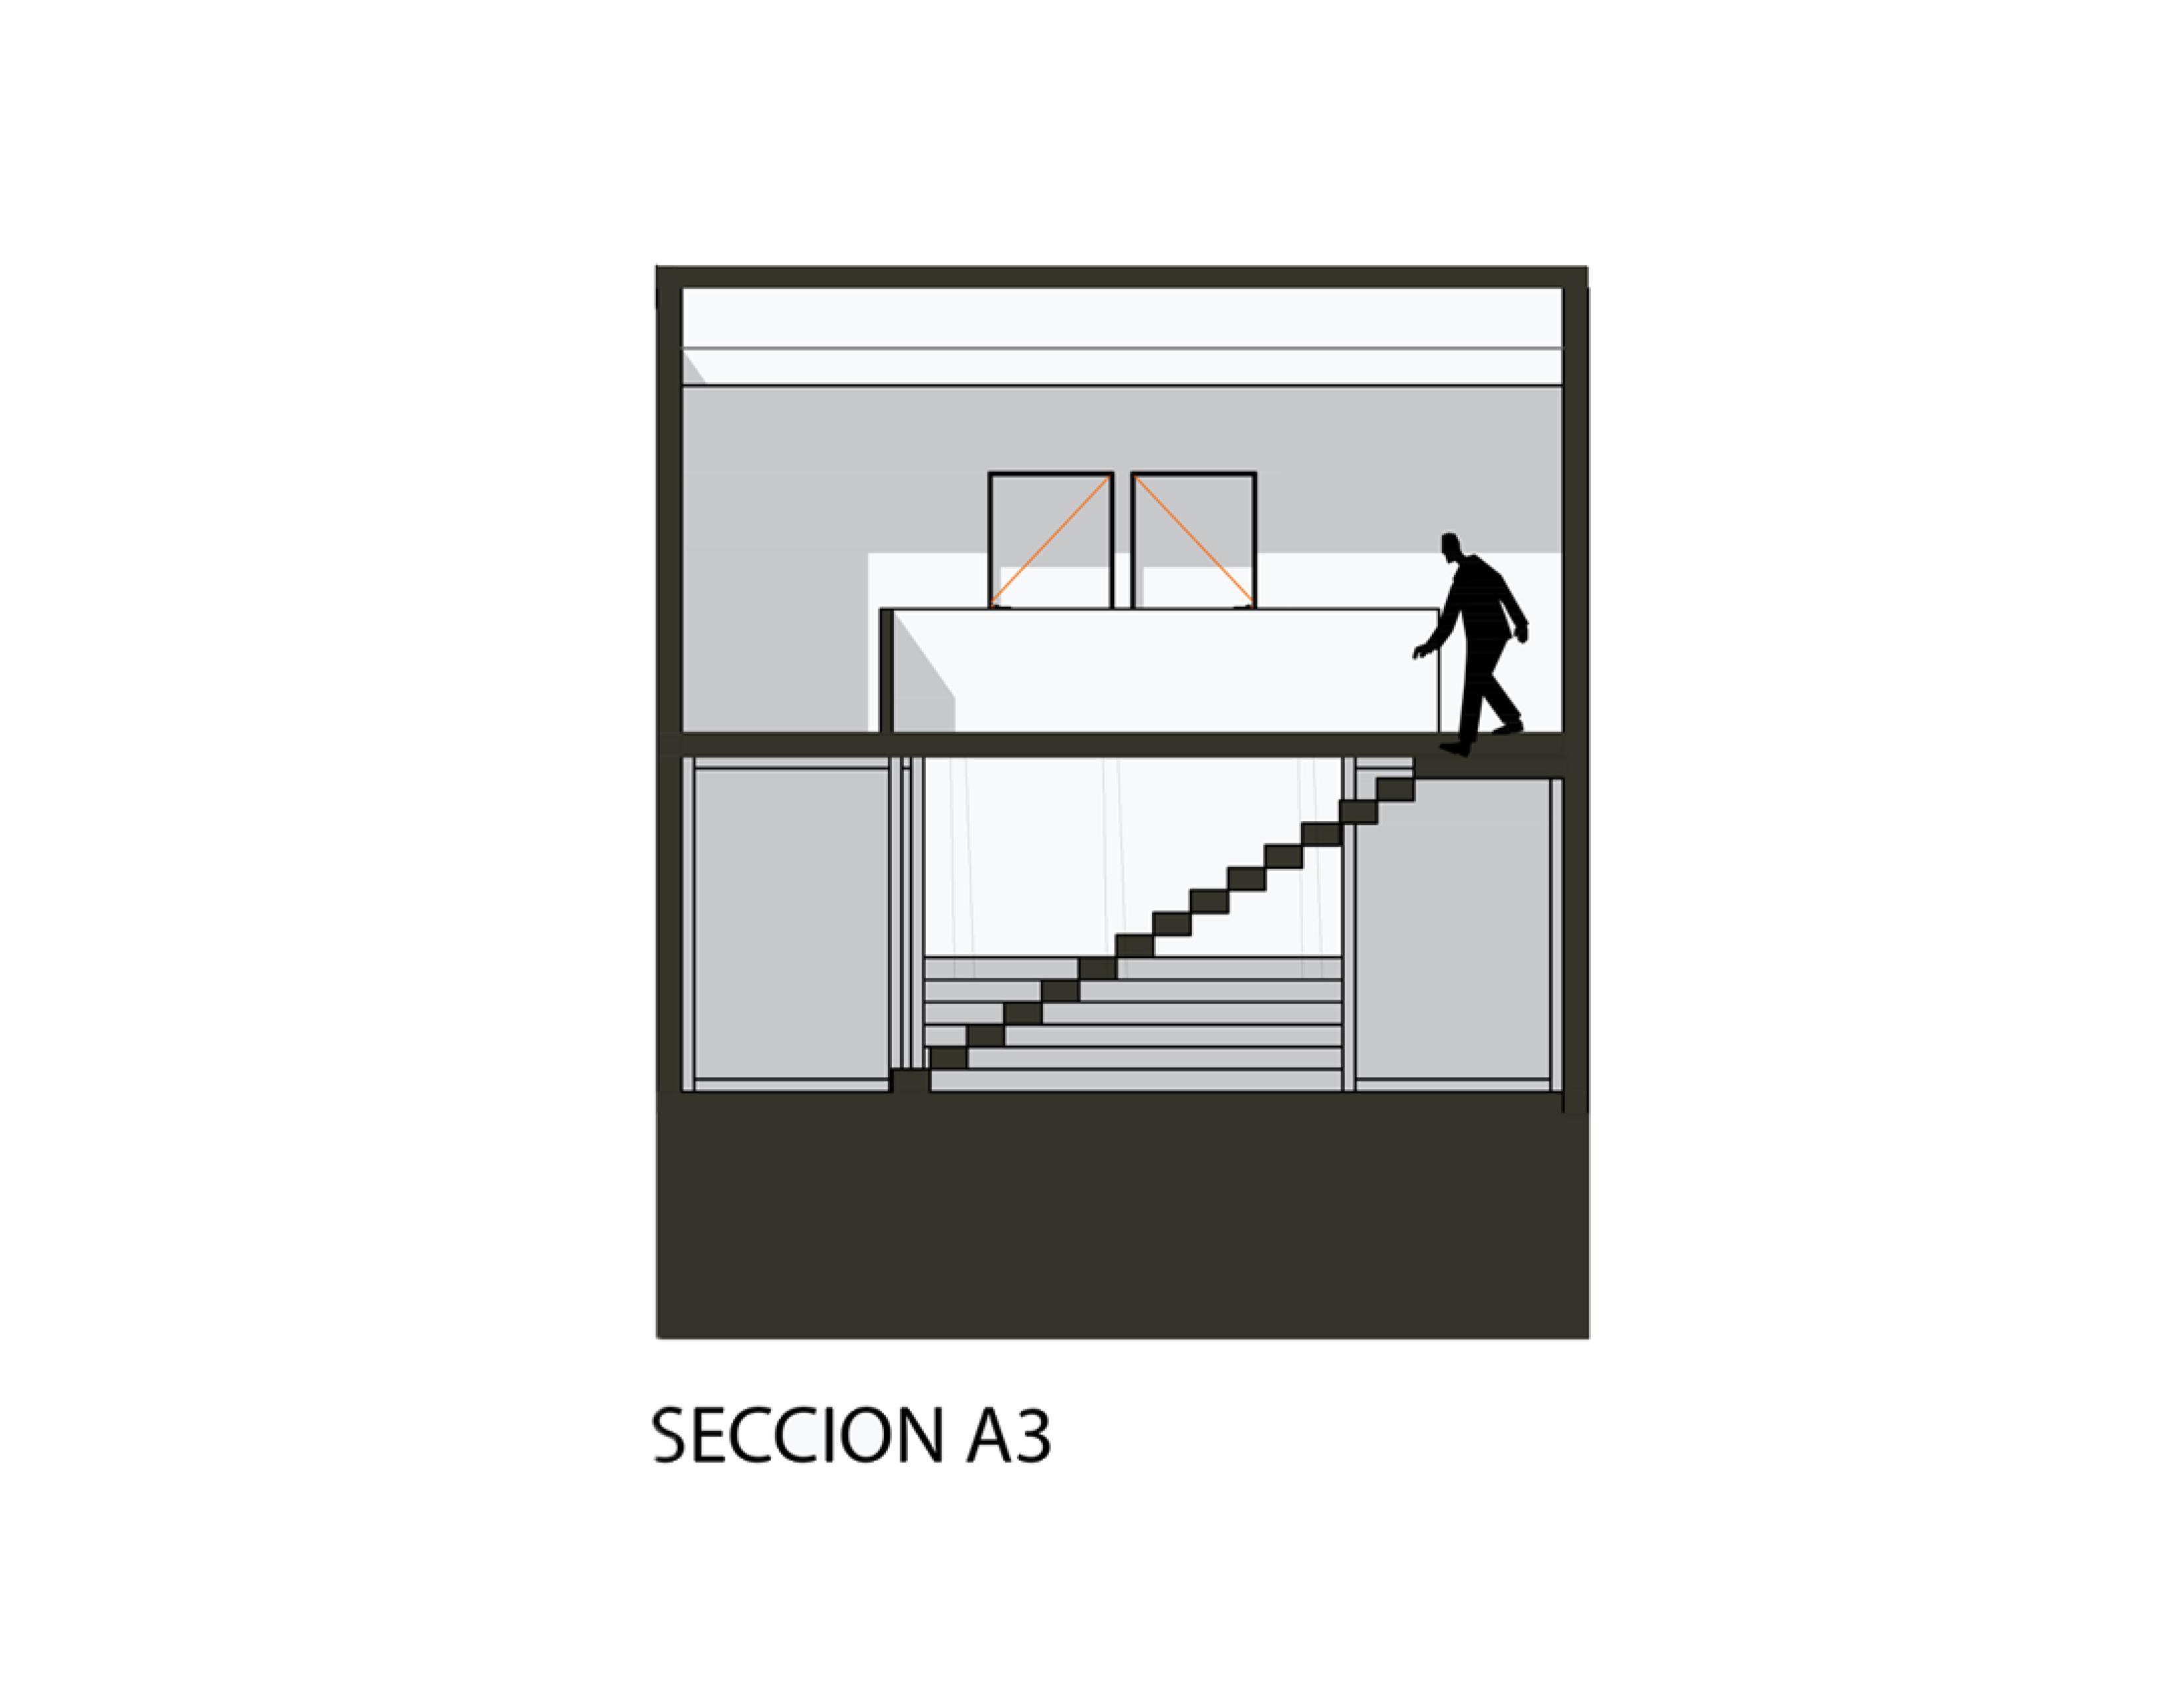 Sección A3-03